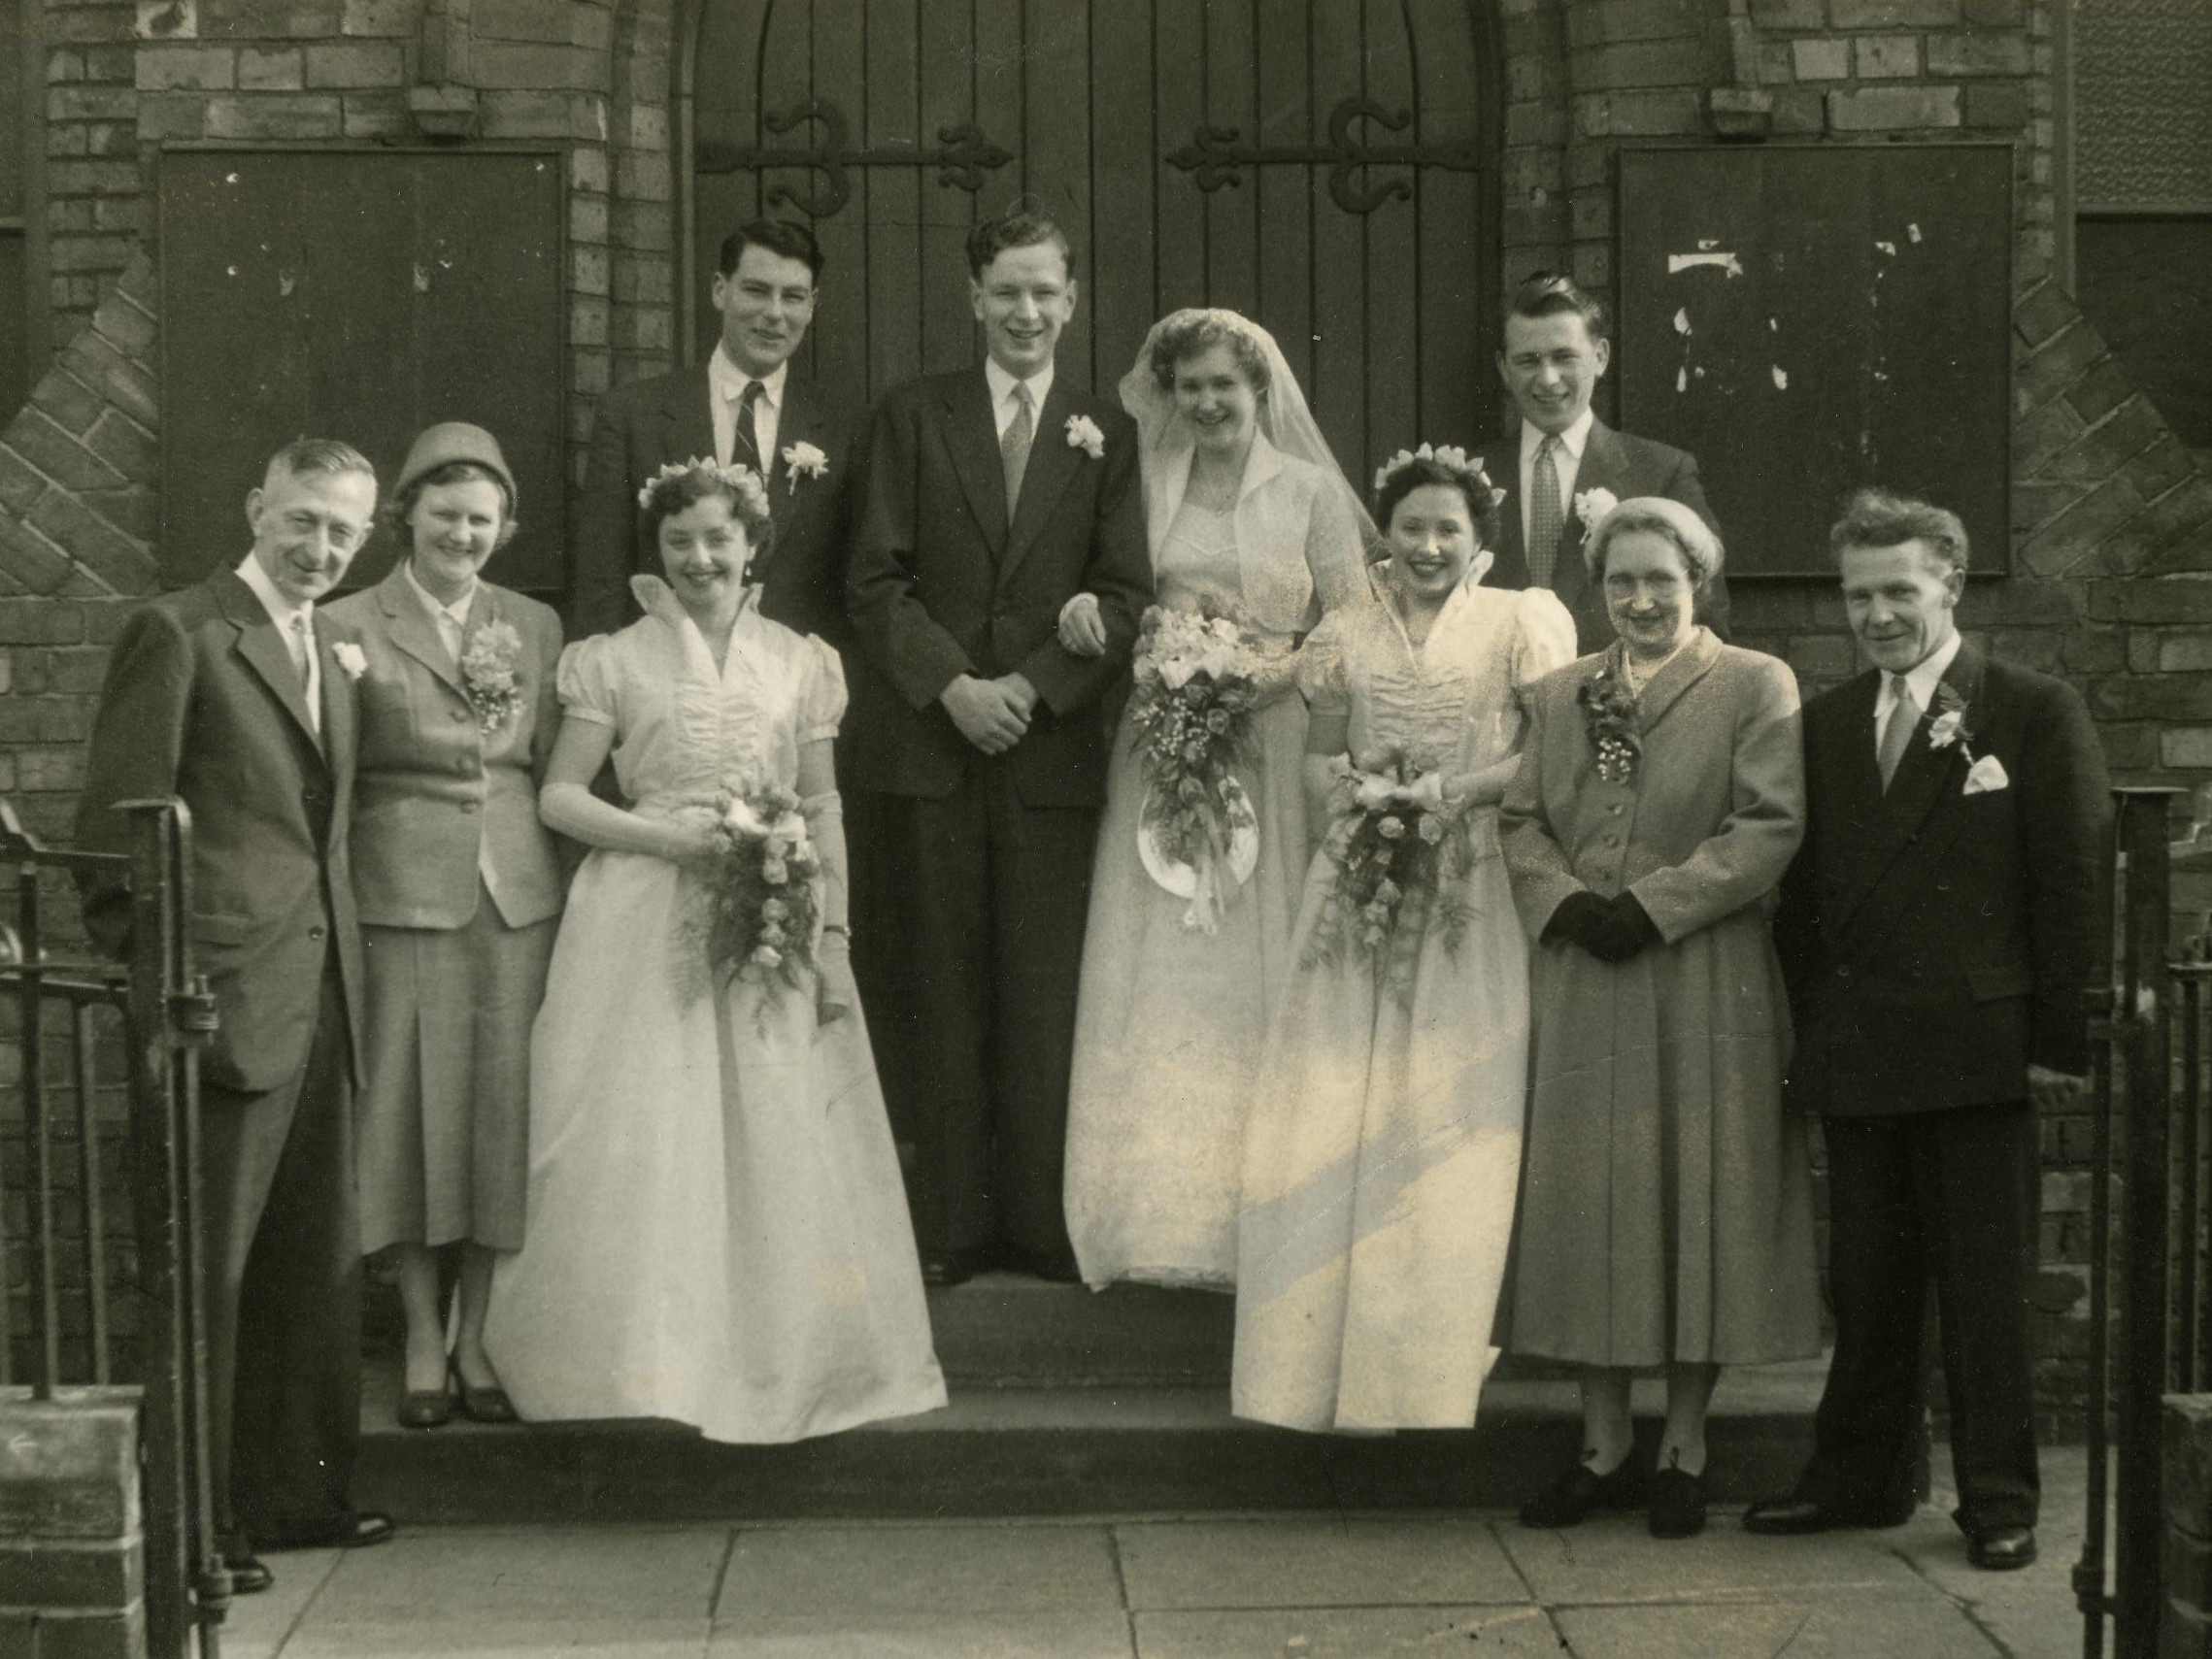 Edwin Ward & Isobel (Ishie) Shaw's Wedding